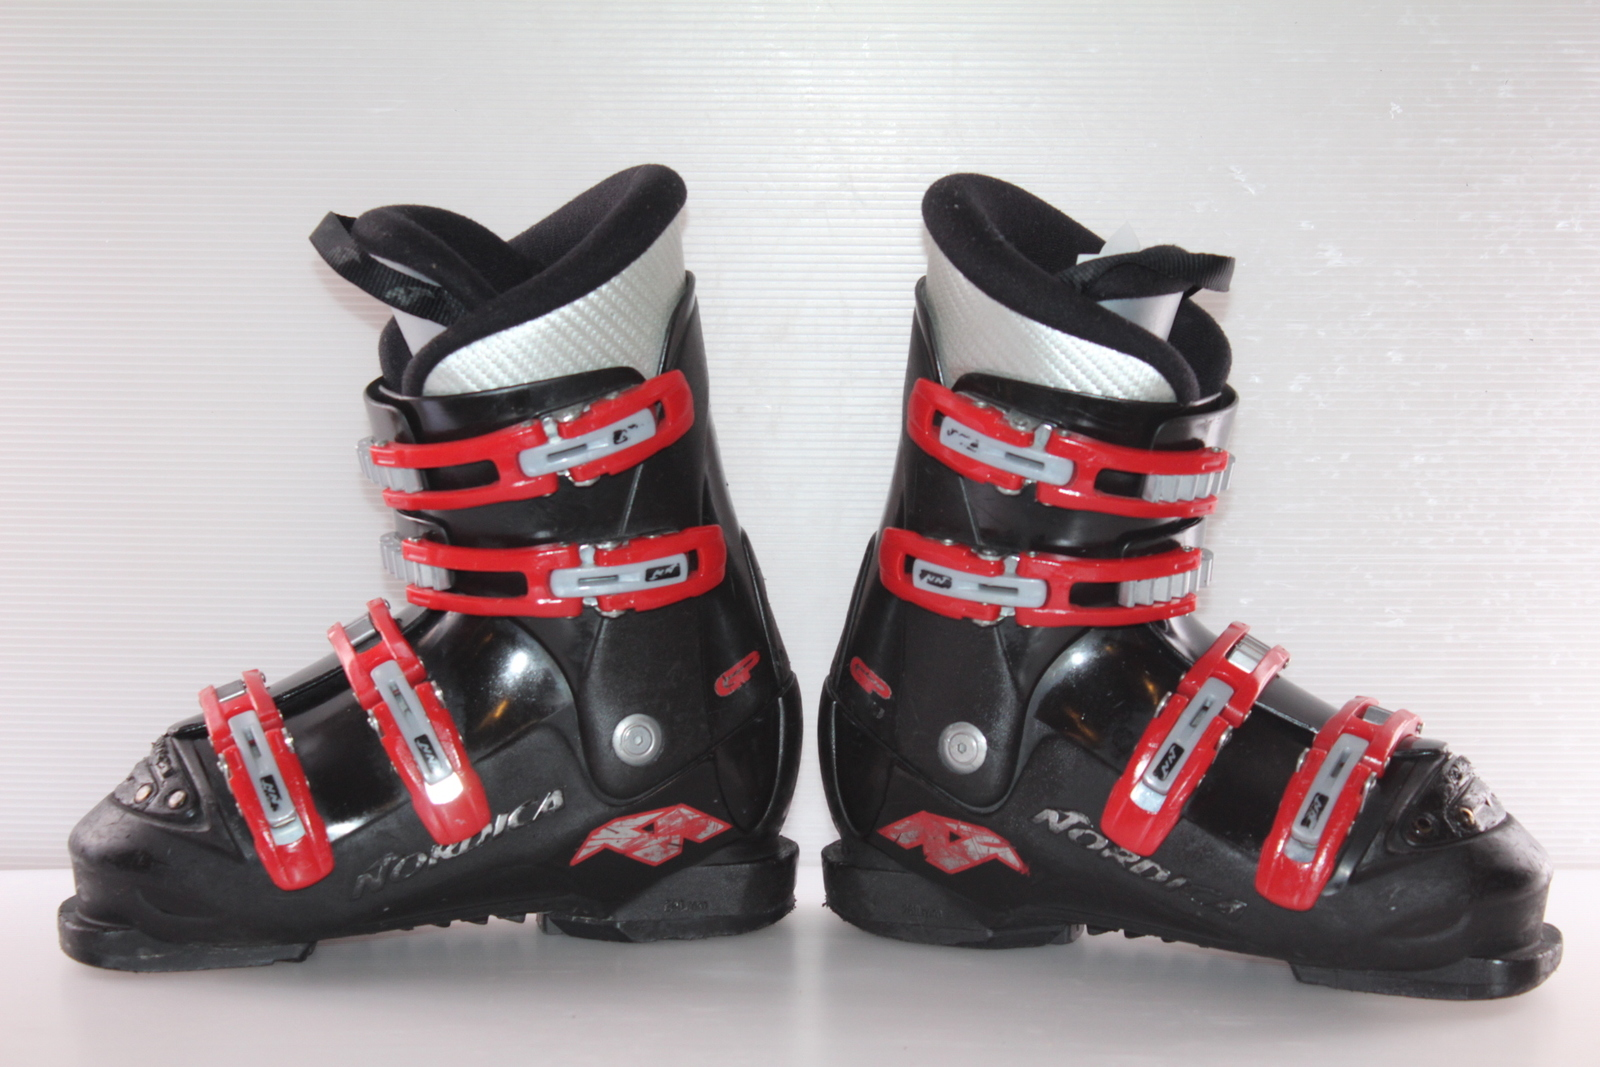 Dětské lyžáky Nordica GP TJ vel. EU36. skladem 4b71343511